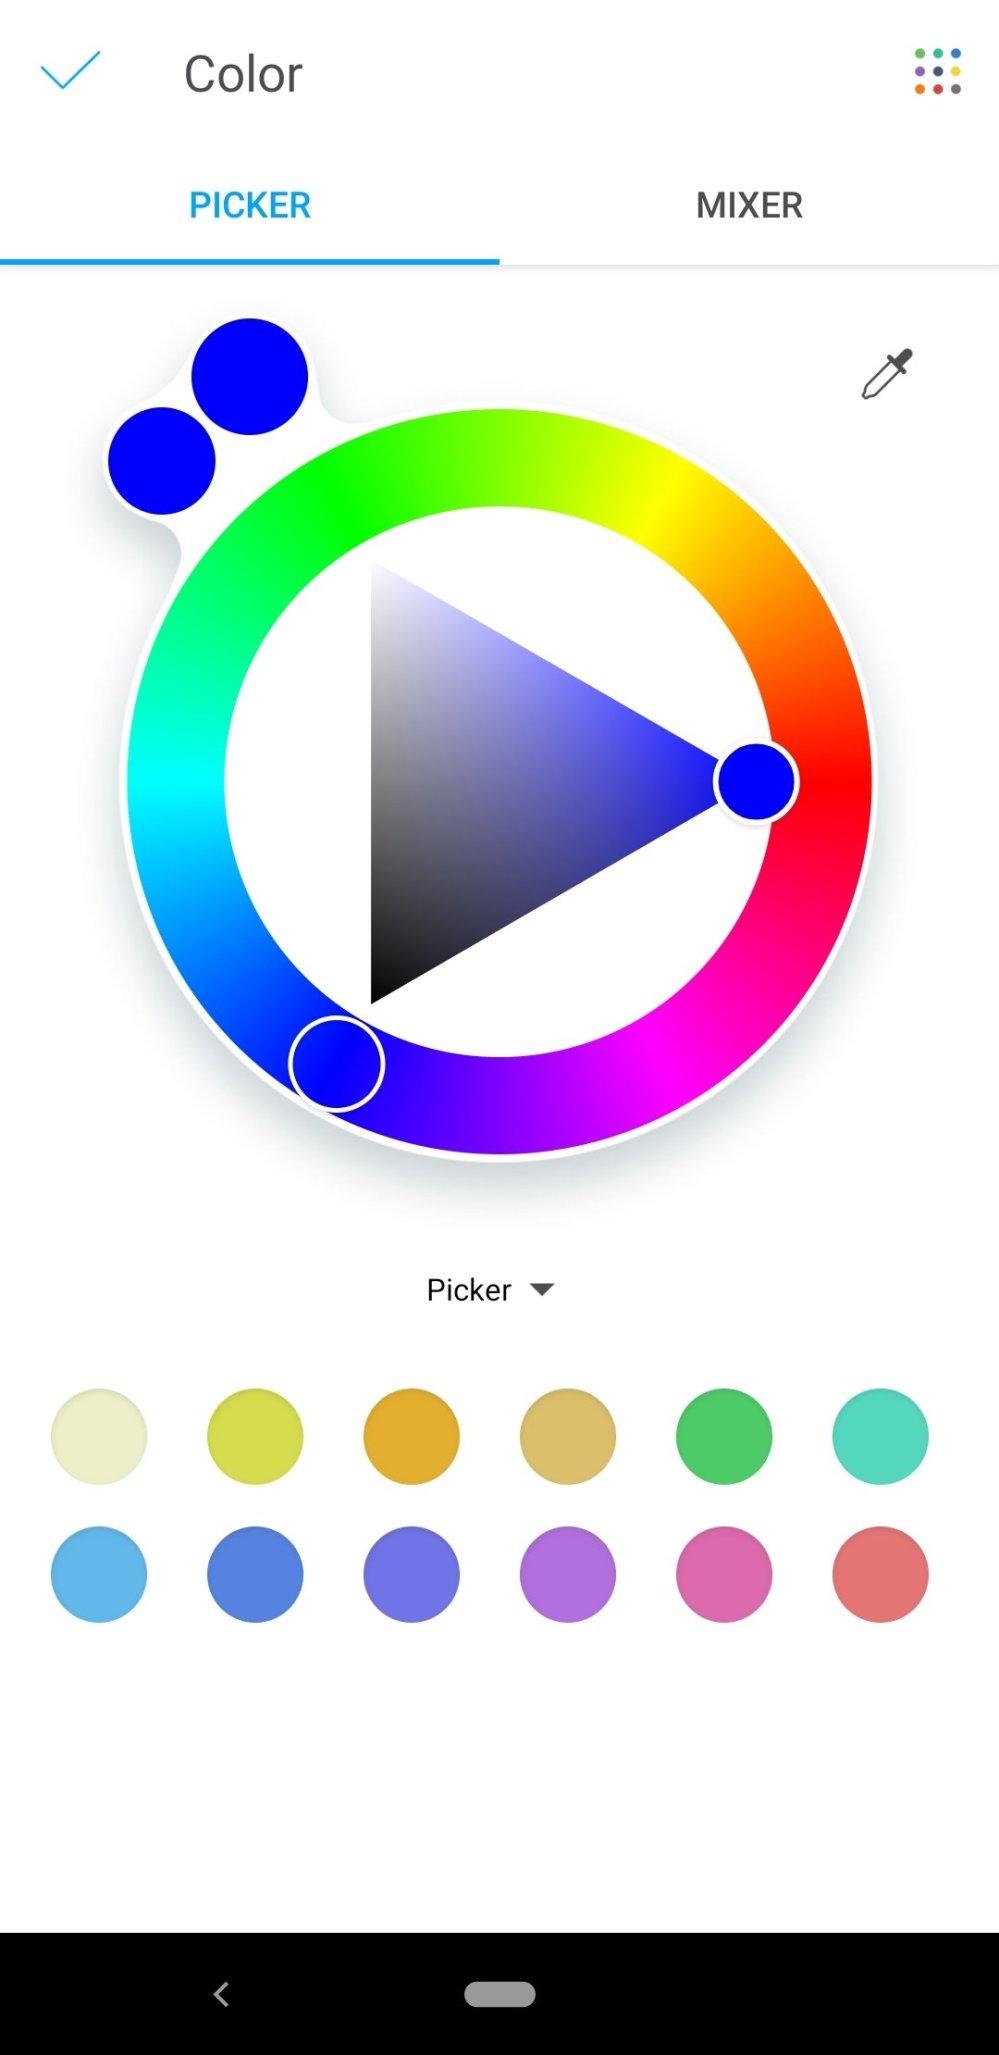 medium resolution of picsart color pintar imagen 1 thumbnail picsart color pintar imagen 2 thumbnail